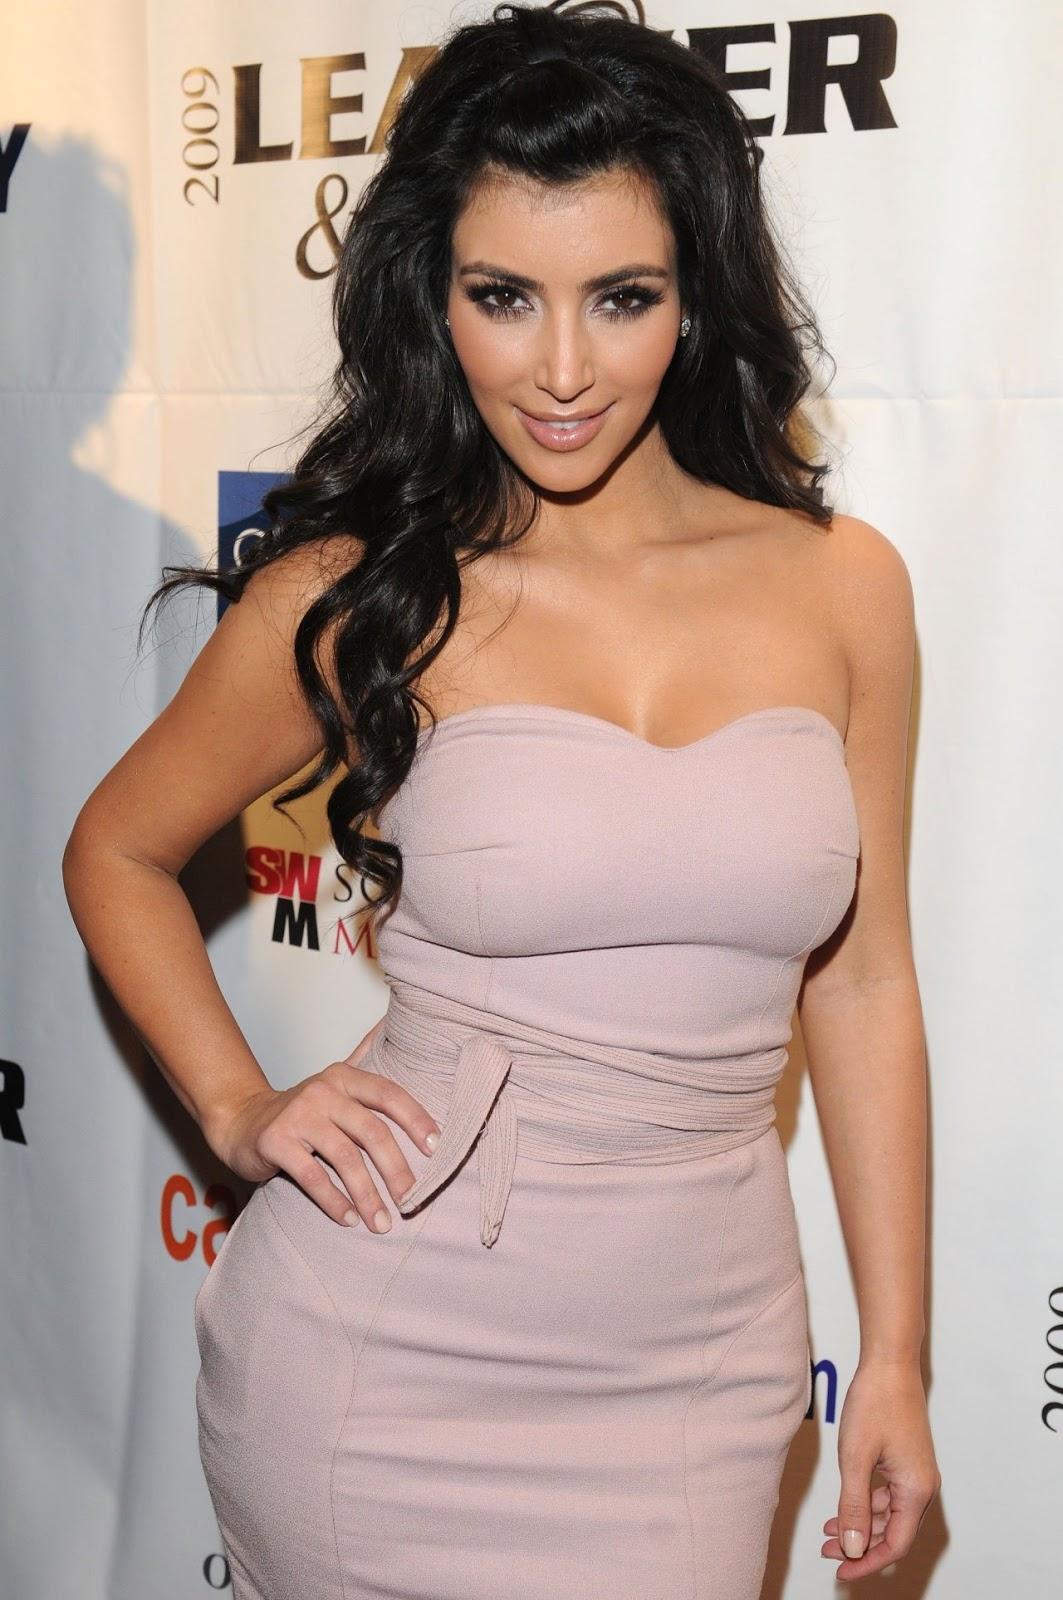 http://3.bp.blogspot.com/-F52Dh0qSoKc/T5NTUgNHl_I/AAAAAAAAKSg/g8-f53aNNHc/s1600/kim_kardashian.jpg